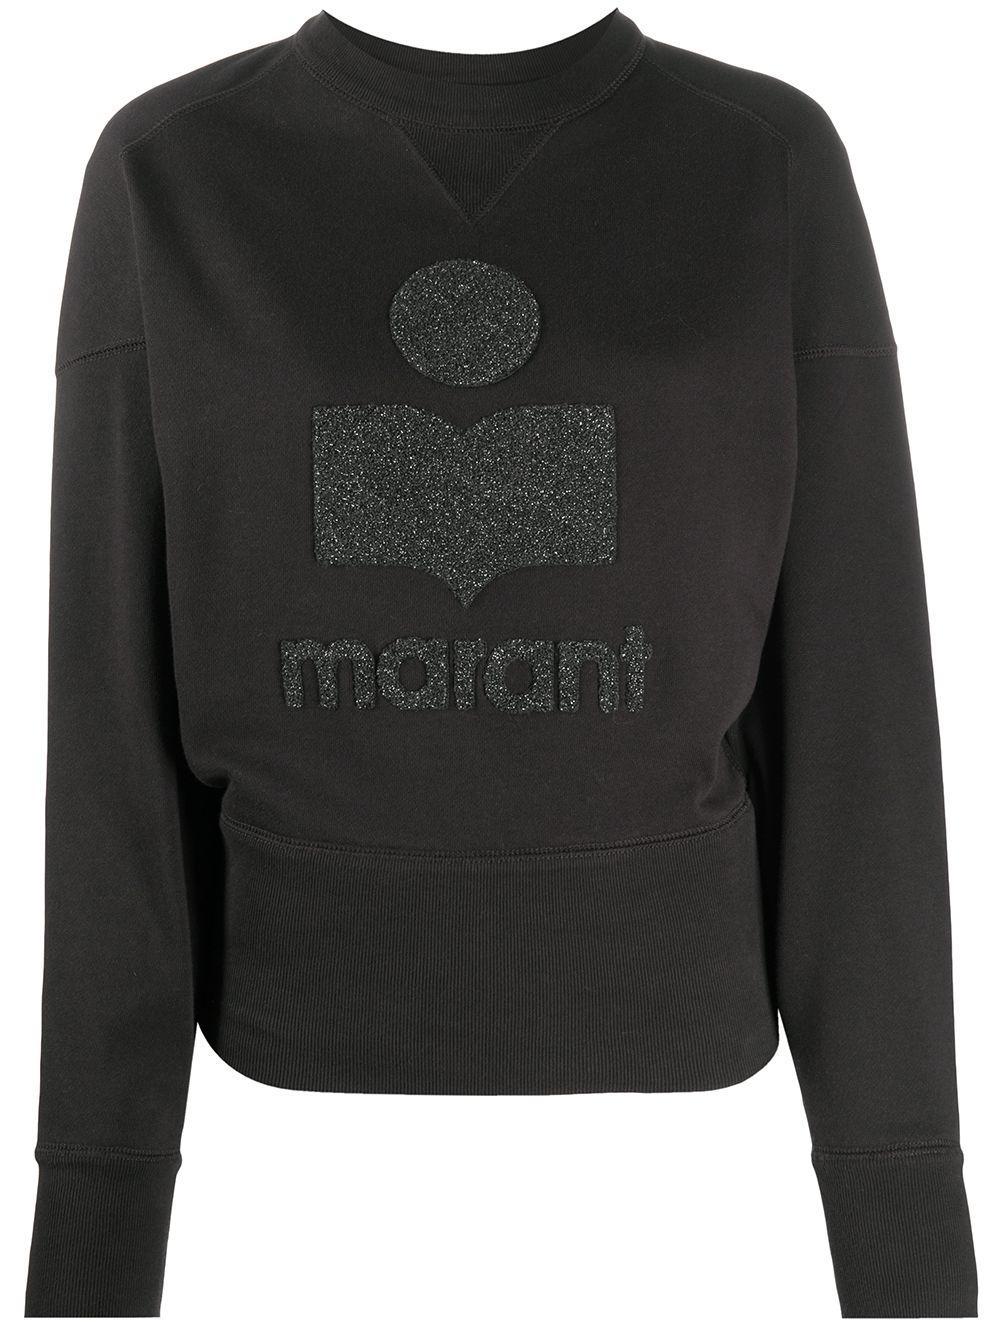 Teloya Lurex Marant Sweatshirt